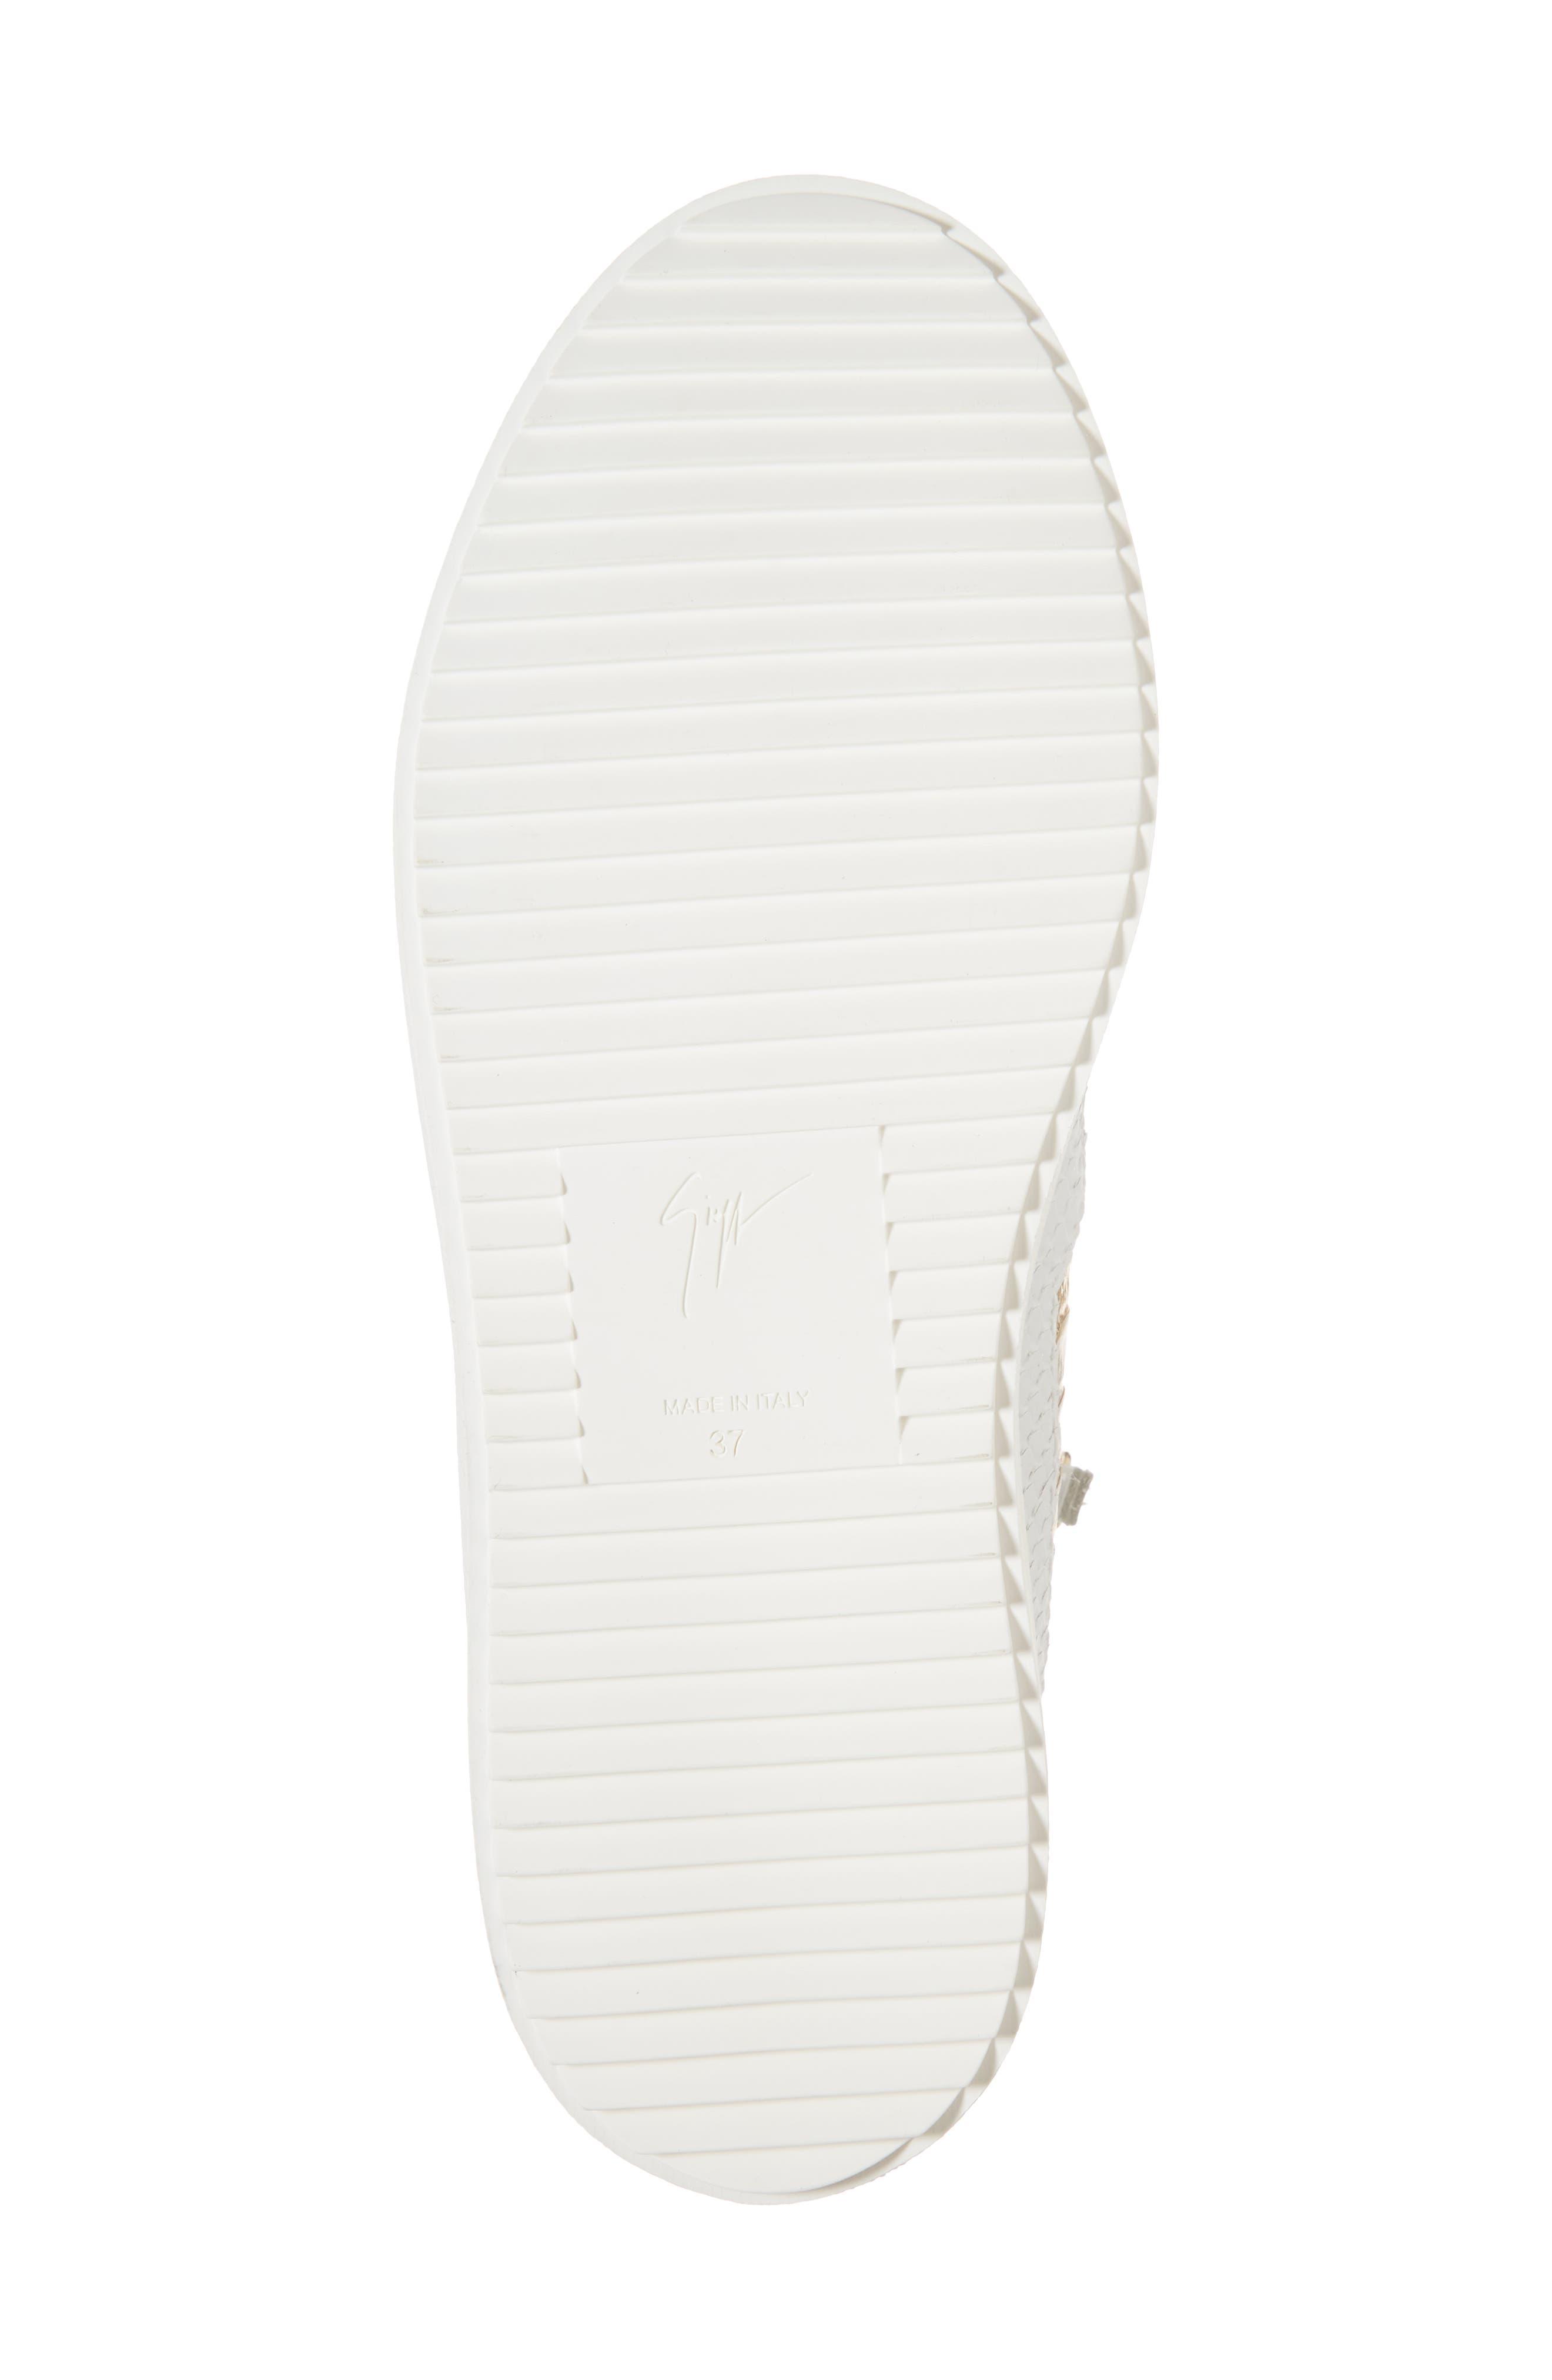 GIUSEPPE ZANOTTI, May London Mid Top Sneaker, Alternate thumbnail 6, color, WHITE/NEON YELLOW